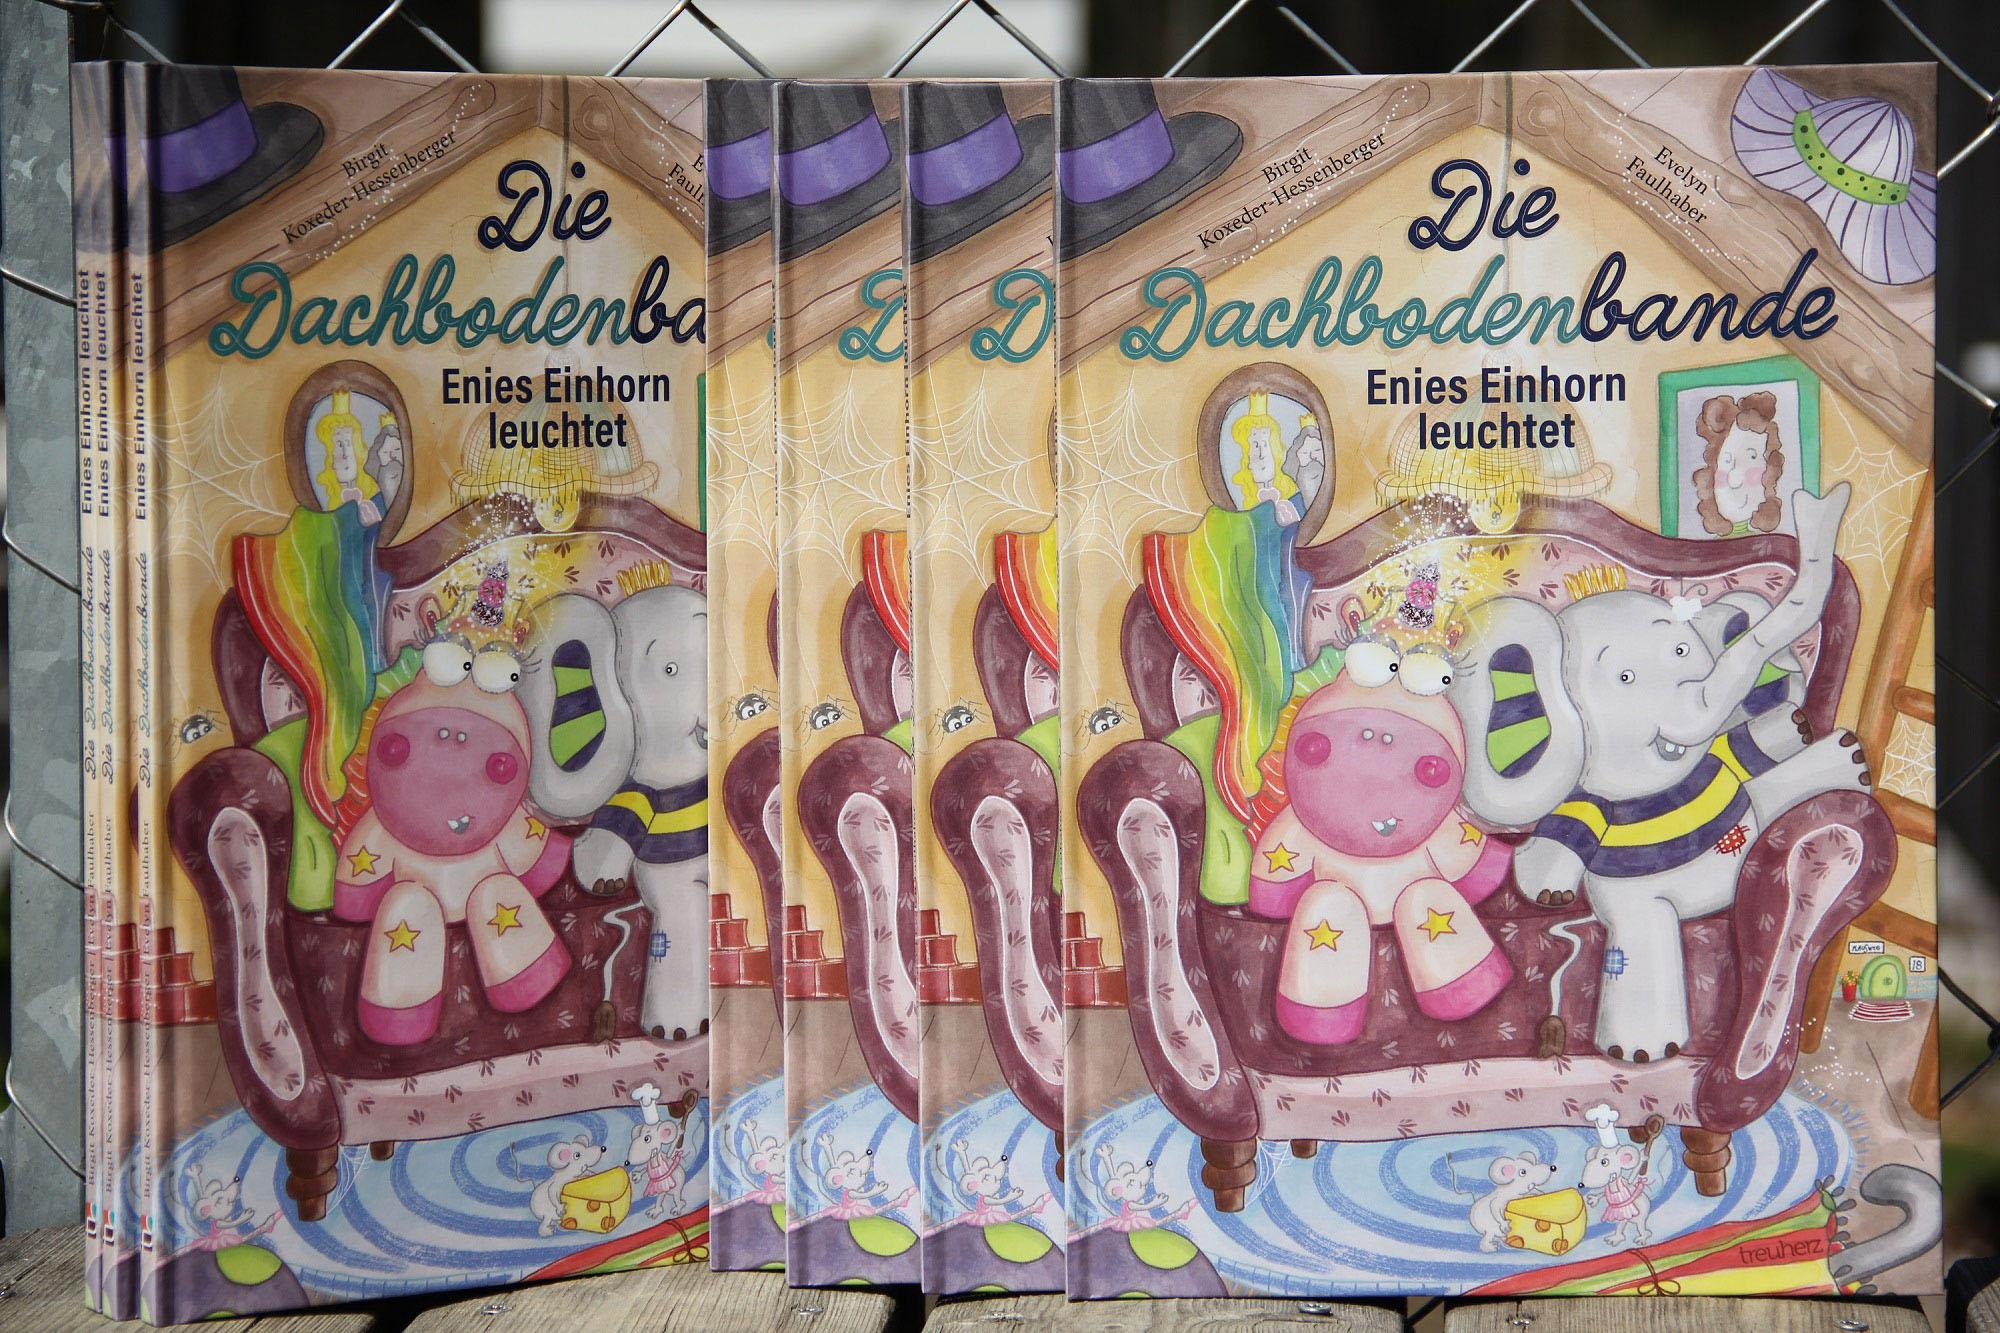 die dachbodenbande - enies einhorn leuchtet, einhorn, elefant, kinderbuch, treuherz verlag, evelyn faulhaber illustration, birgit koxeder-hessenberger